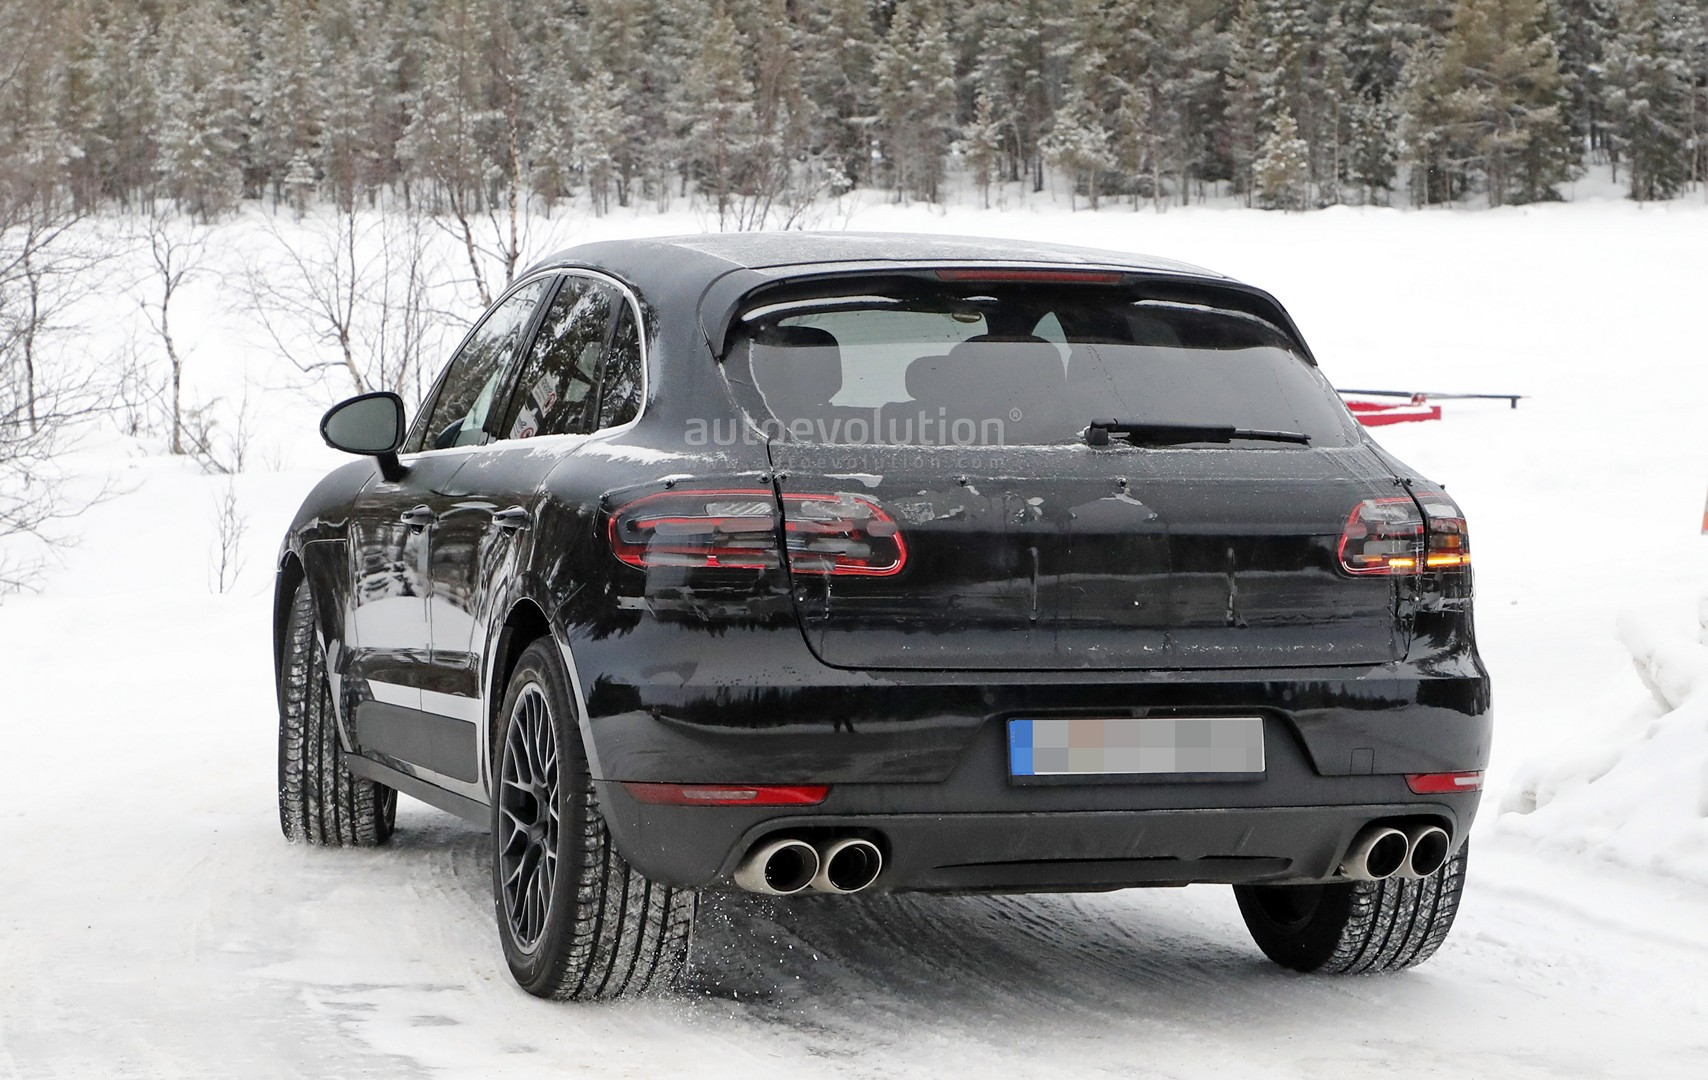 2018 Porsche Macan Facelift Spied Undergoing Winter Testing Autoevolution